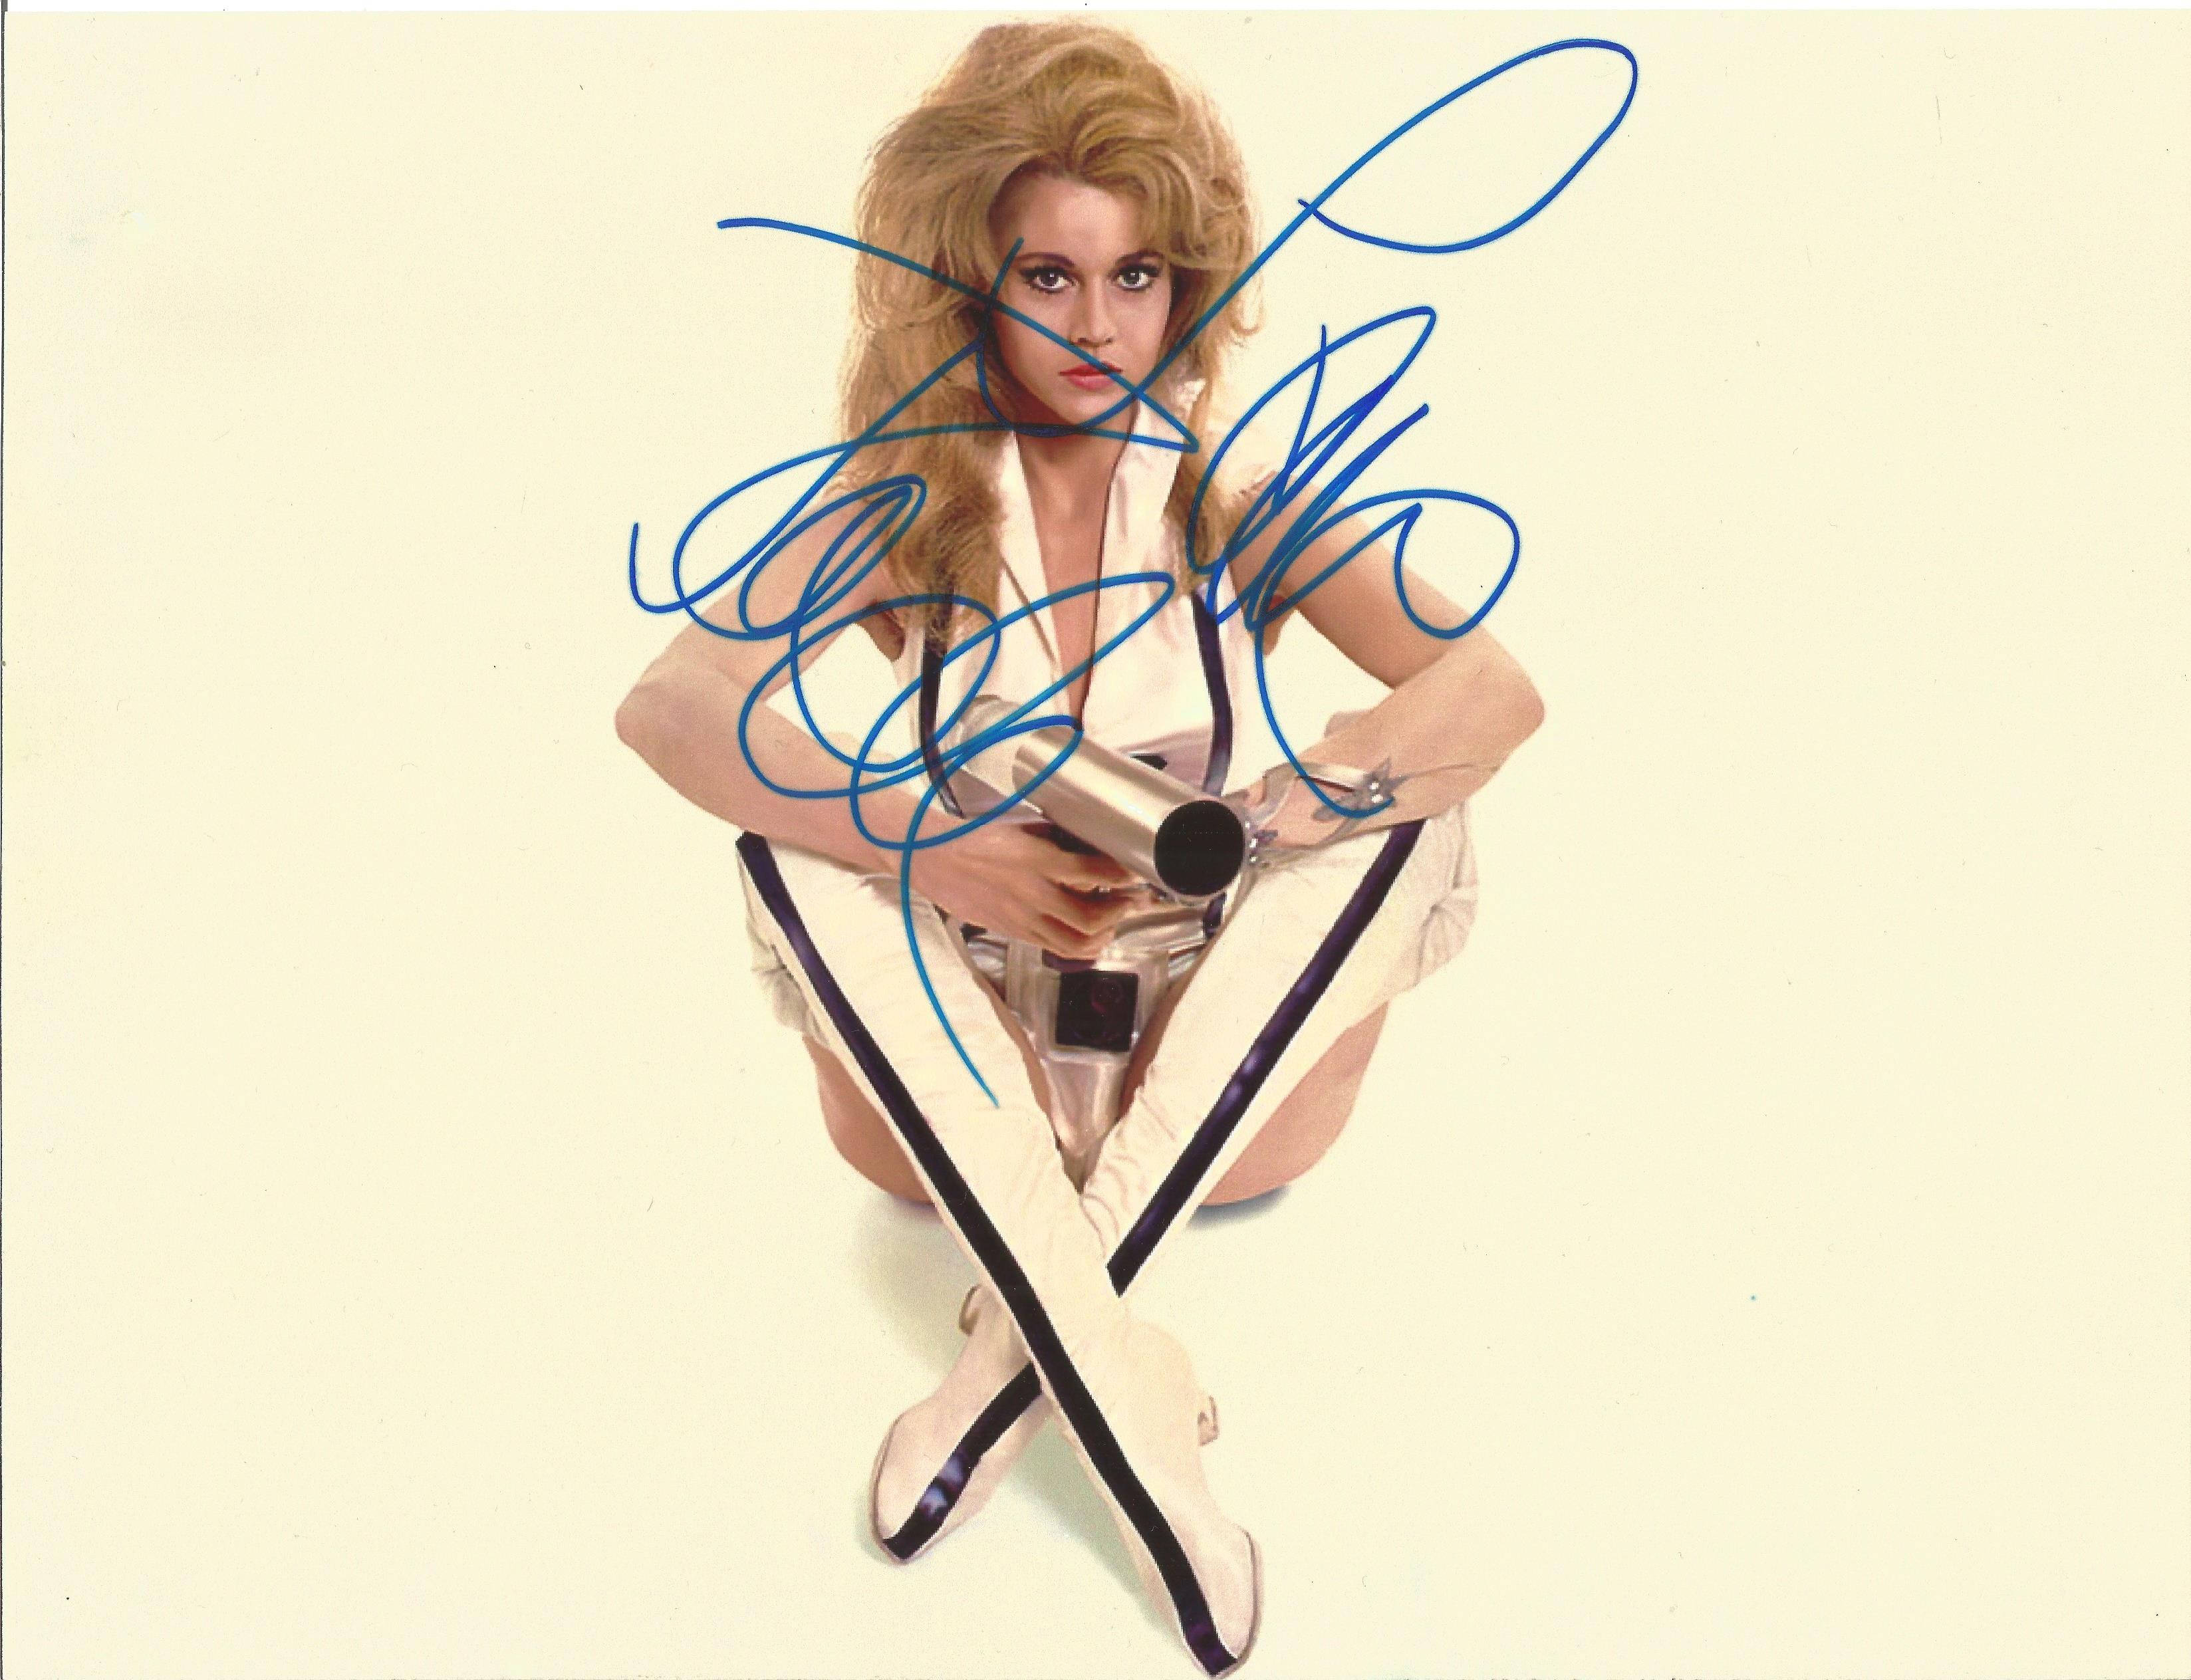 Jane Fonda signed 10x8 Barbarella colour photo. Jane Seymour Fonda (born December 21, 1937) is an